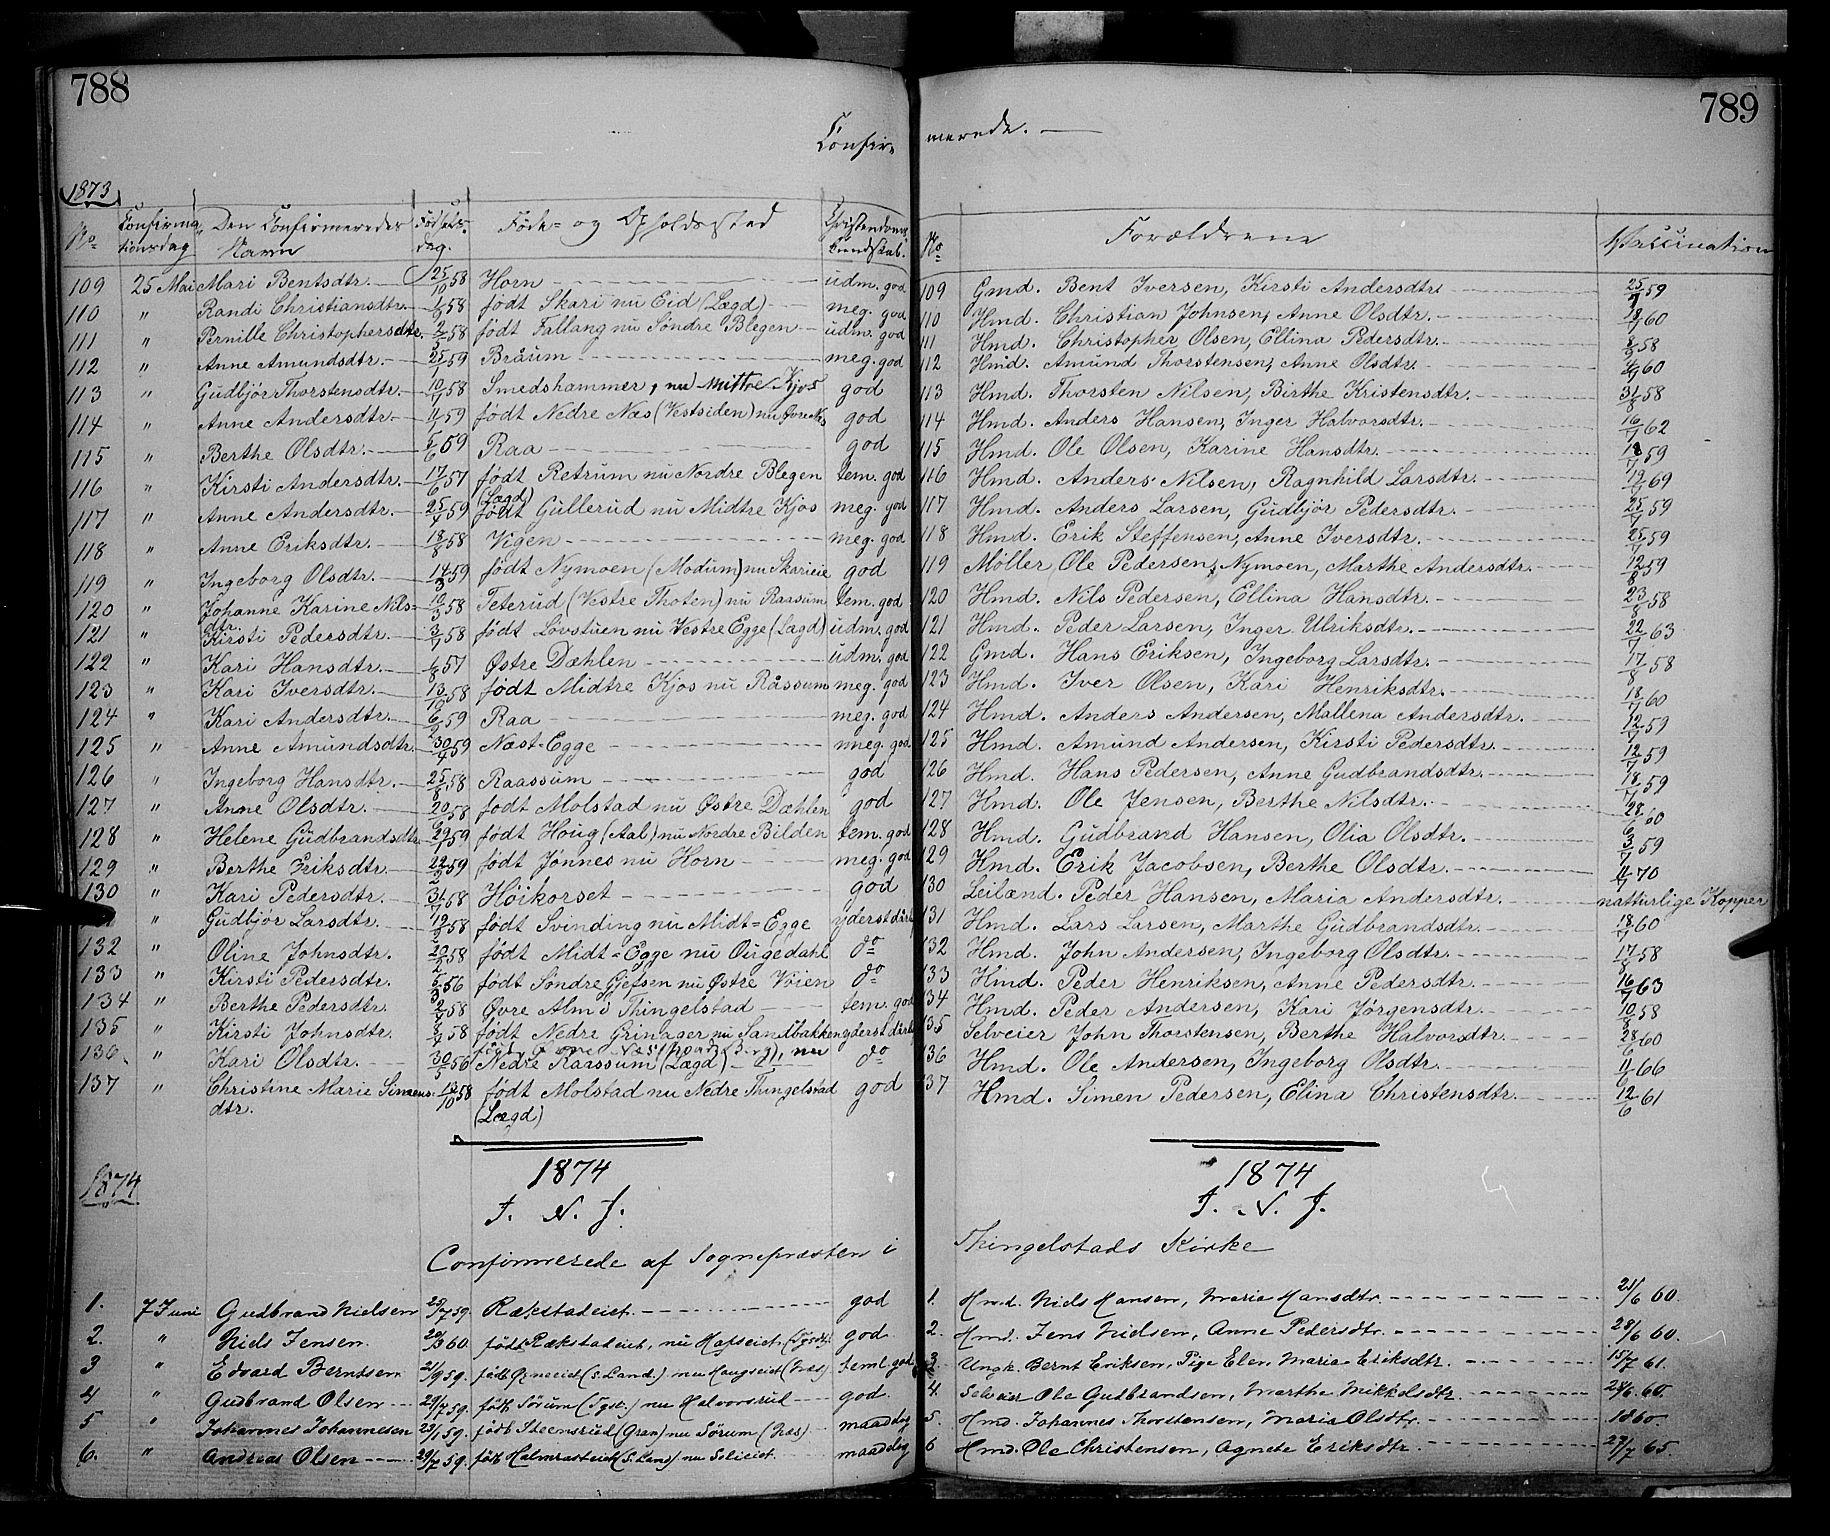 SAH, Gran prestekontor, Ministerialbok nr. 12, 1856-1874, s. 788-789